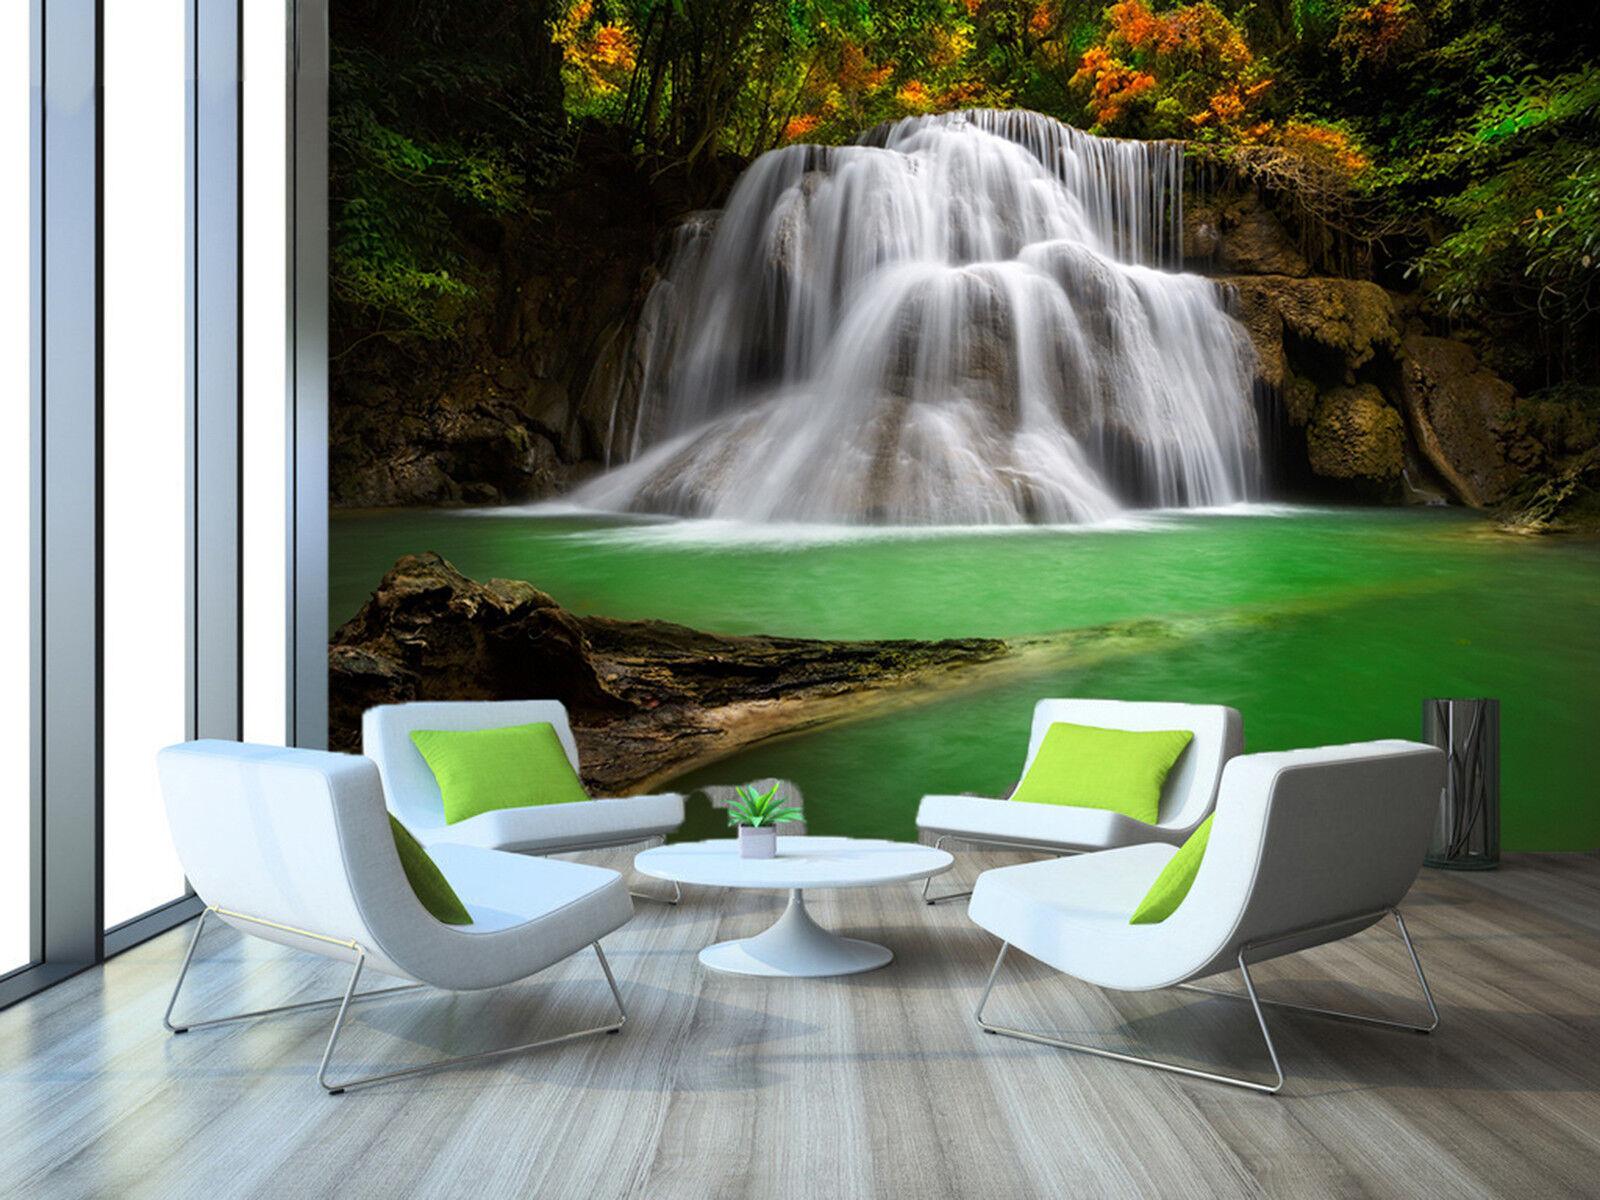 3D Cascade River Fototapeten Wandbild Fototapete Bild Tapete Familie Kinder887